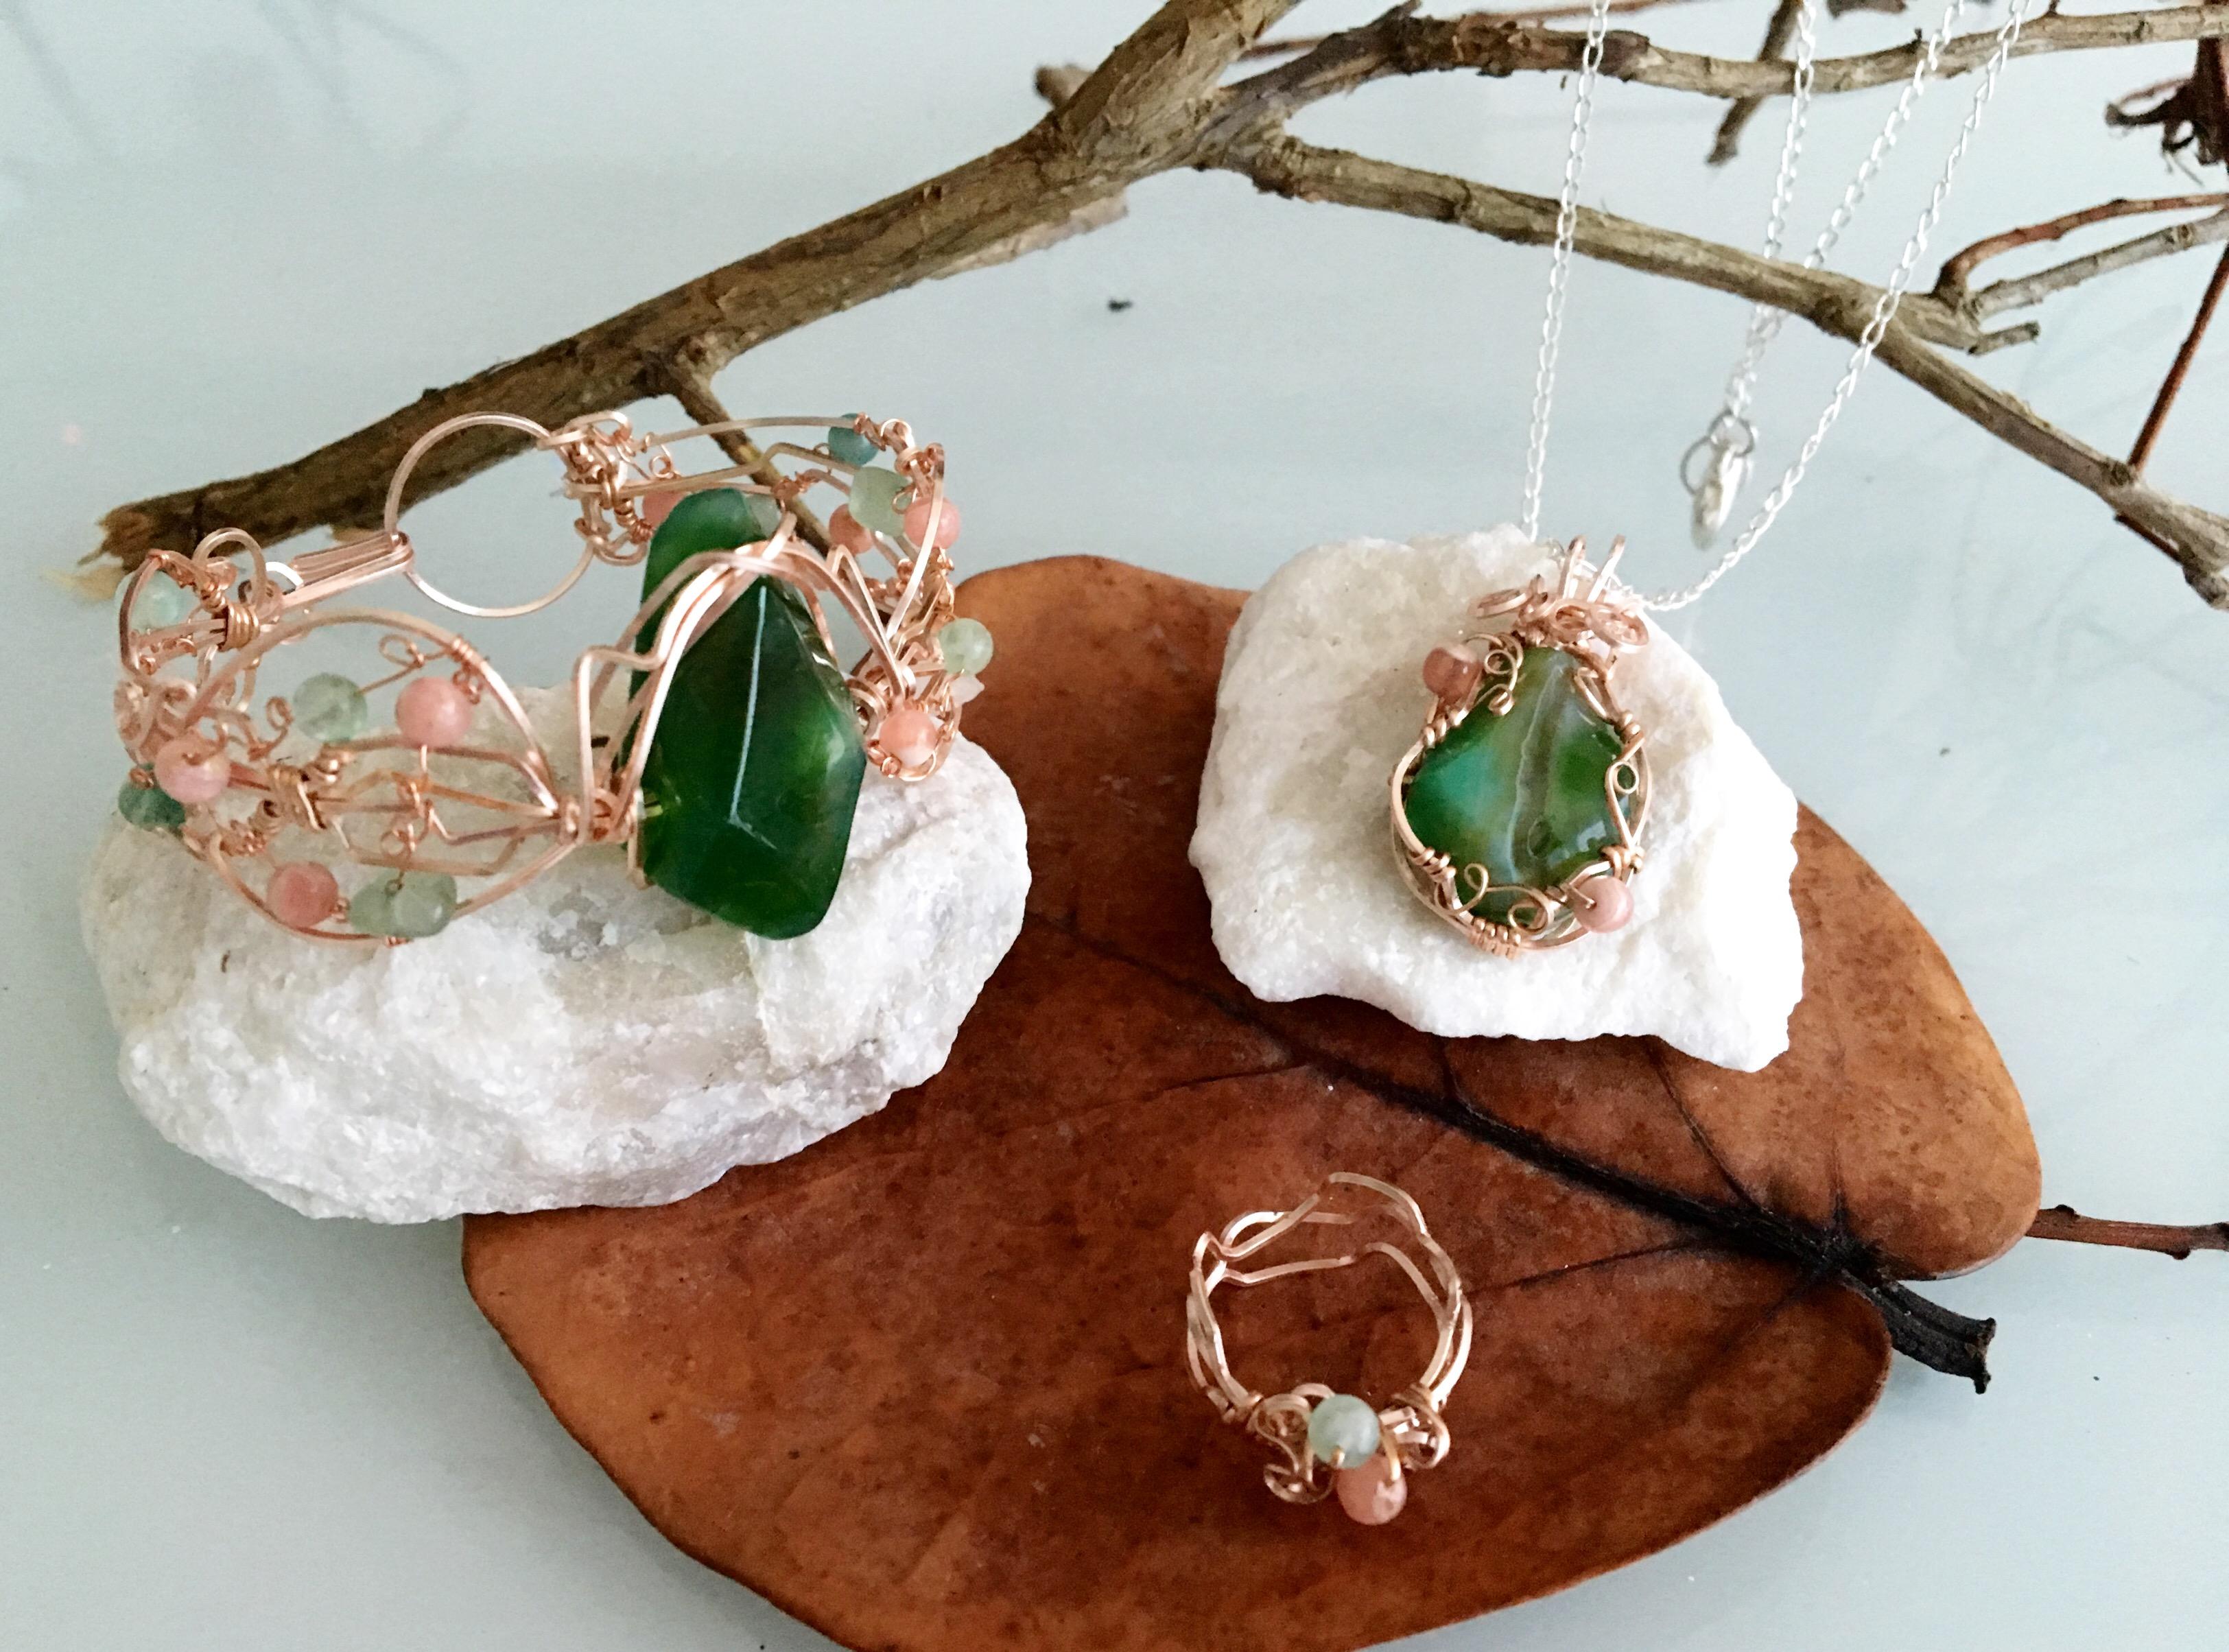 Qhresnna Quartz Set - Green Agathe aventurine and Rhodocrosite - Silver Plated